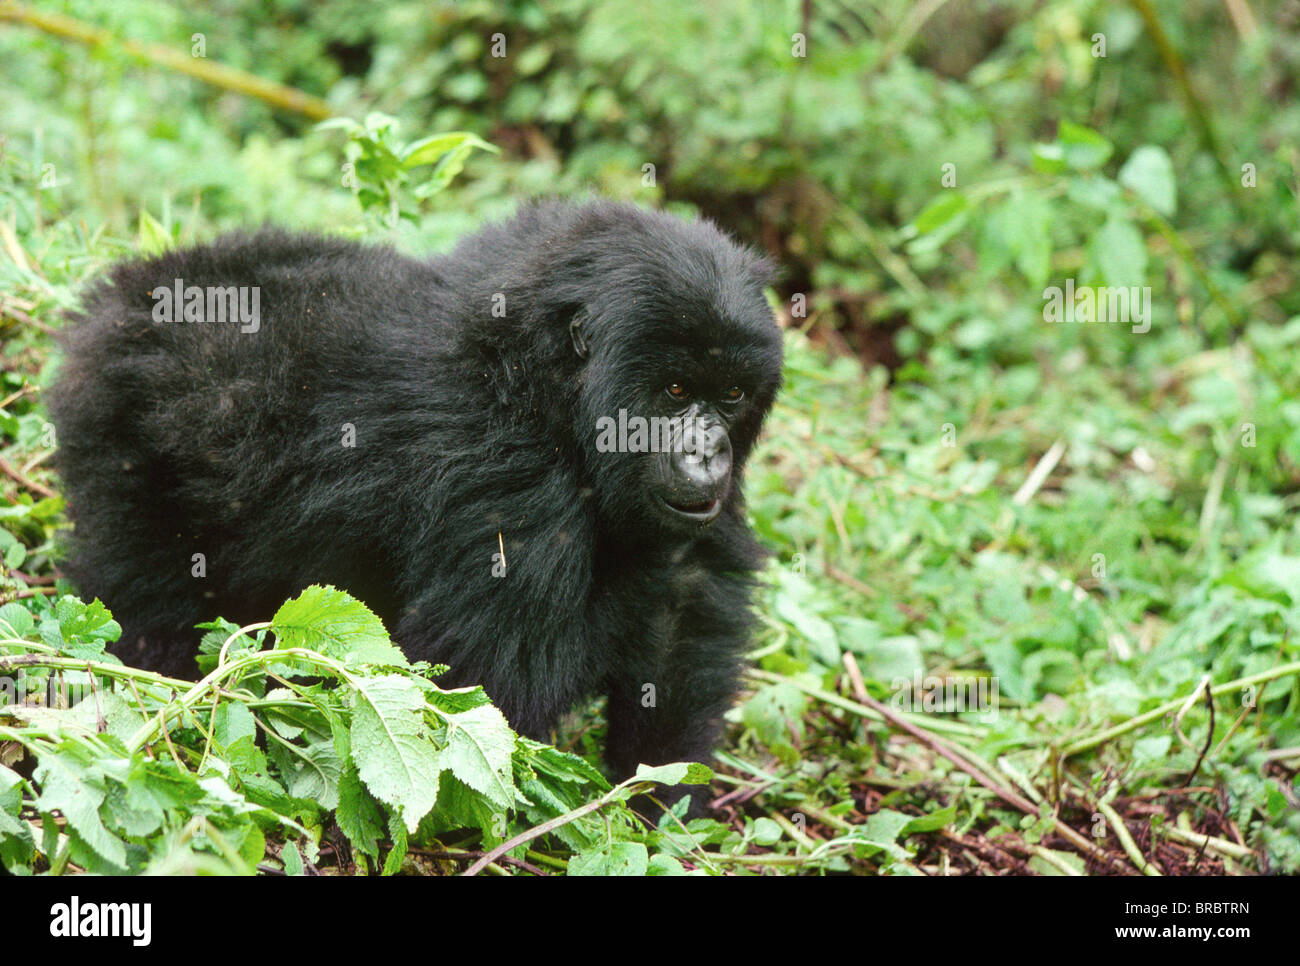 Mountain Gorillas (Gorilla gorilla beringei) juvenile, Virunga Volcanoes, Rwanda - Stock Image